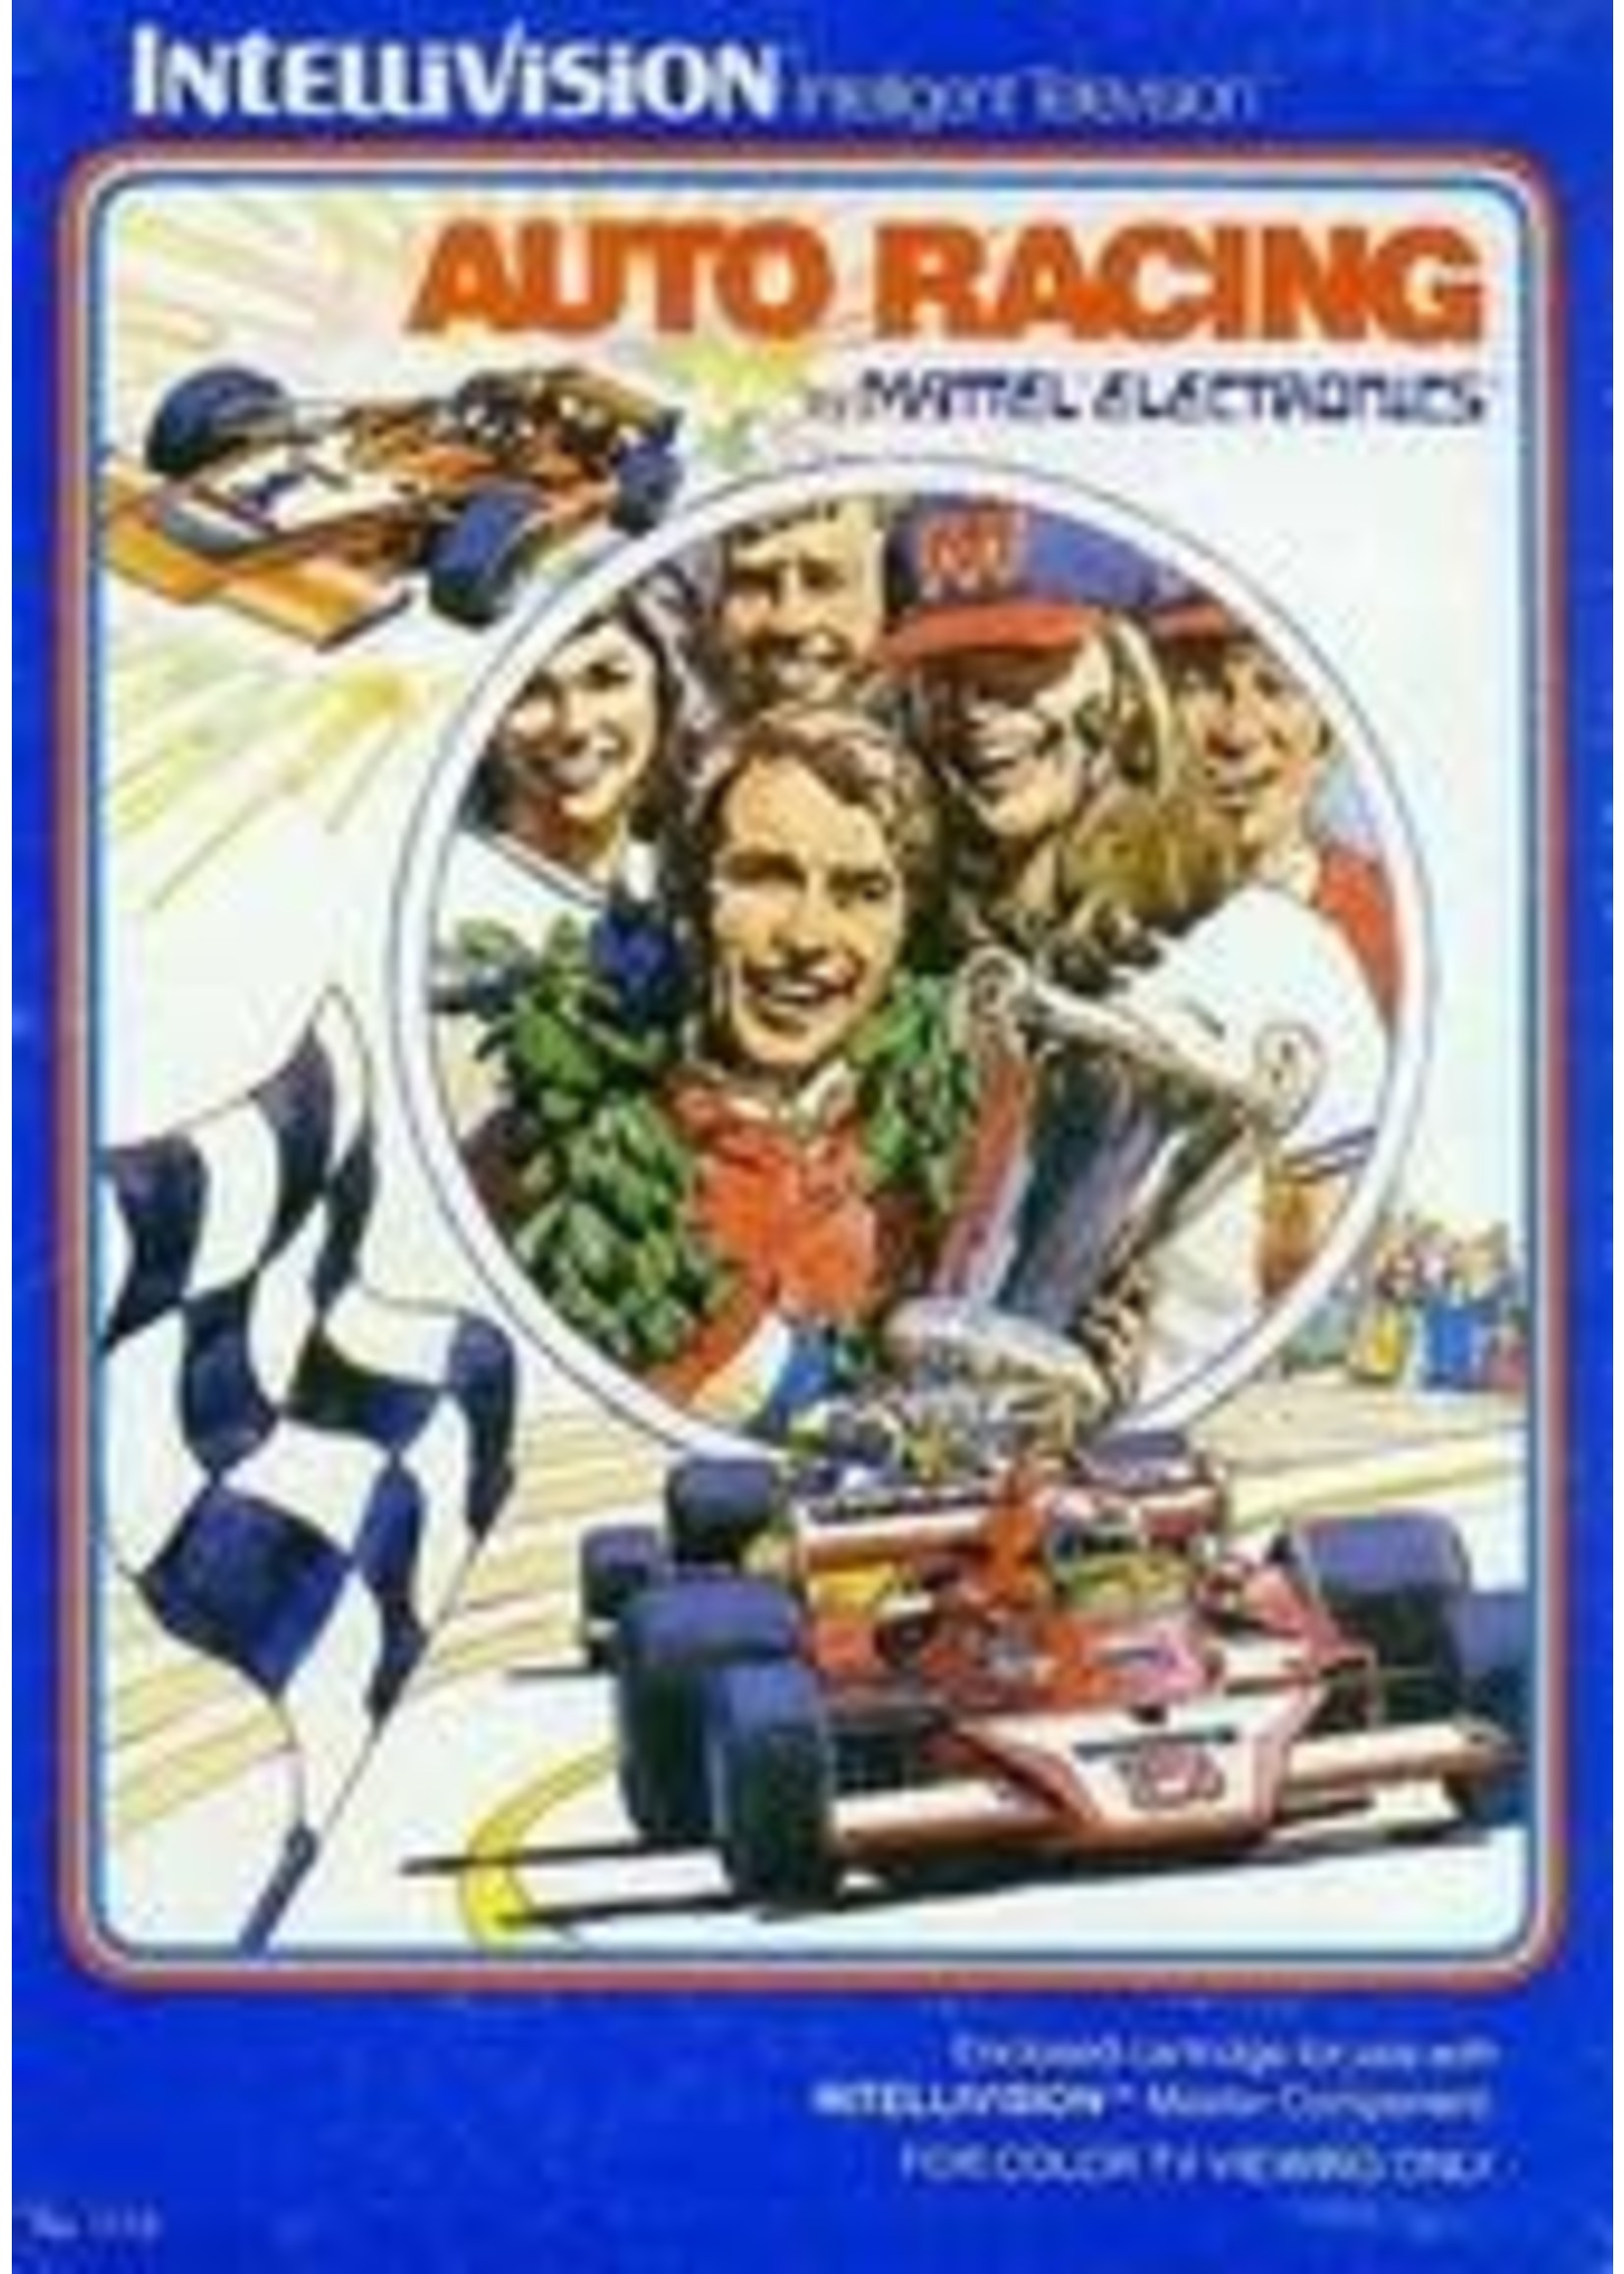 Auto Racing Intellivision